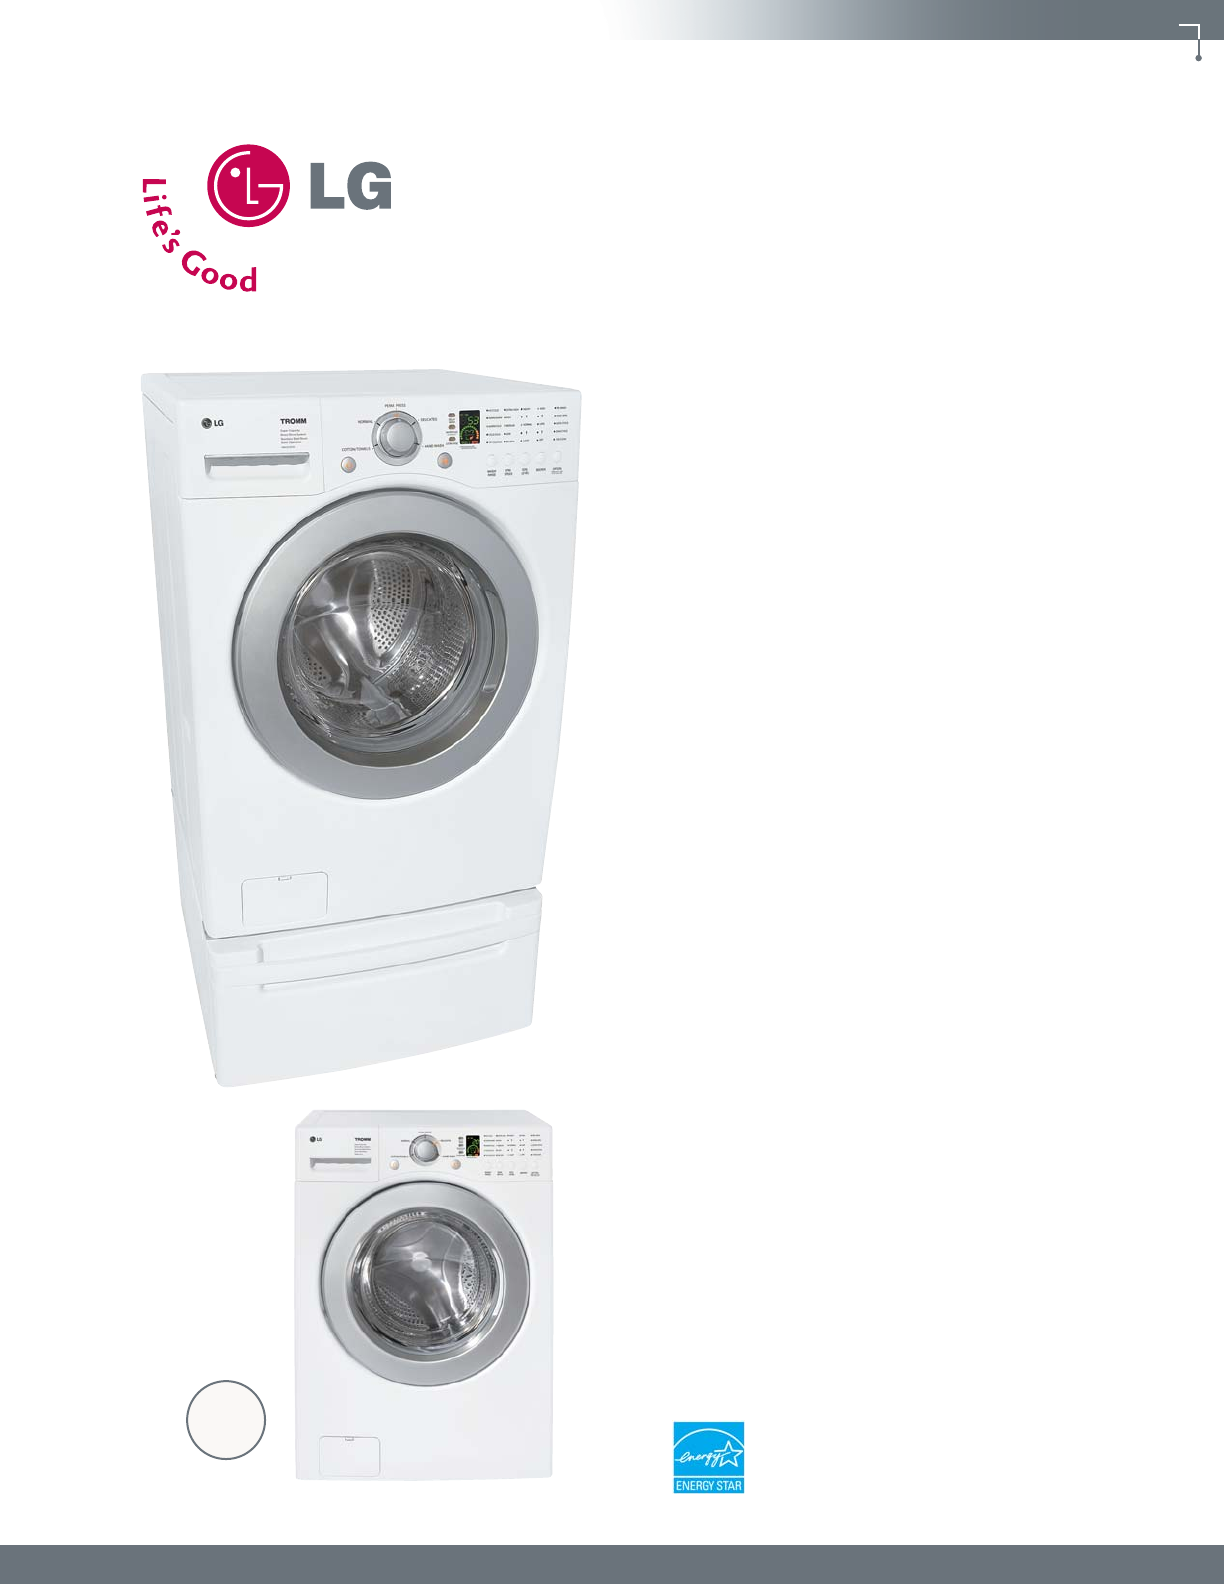 lg wm2016cw 20370 wm2016c spec sheet user manual specification wm2016css rh usermanual wiki LG Tromm Front Load Washer LG Washing Machine Service Manual